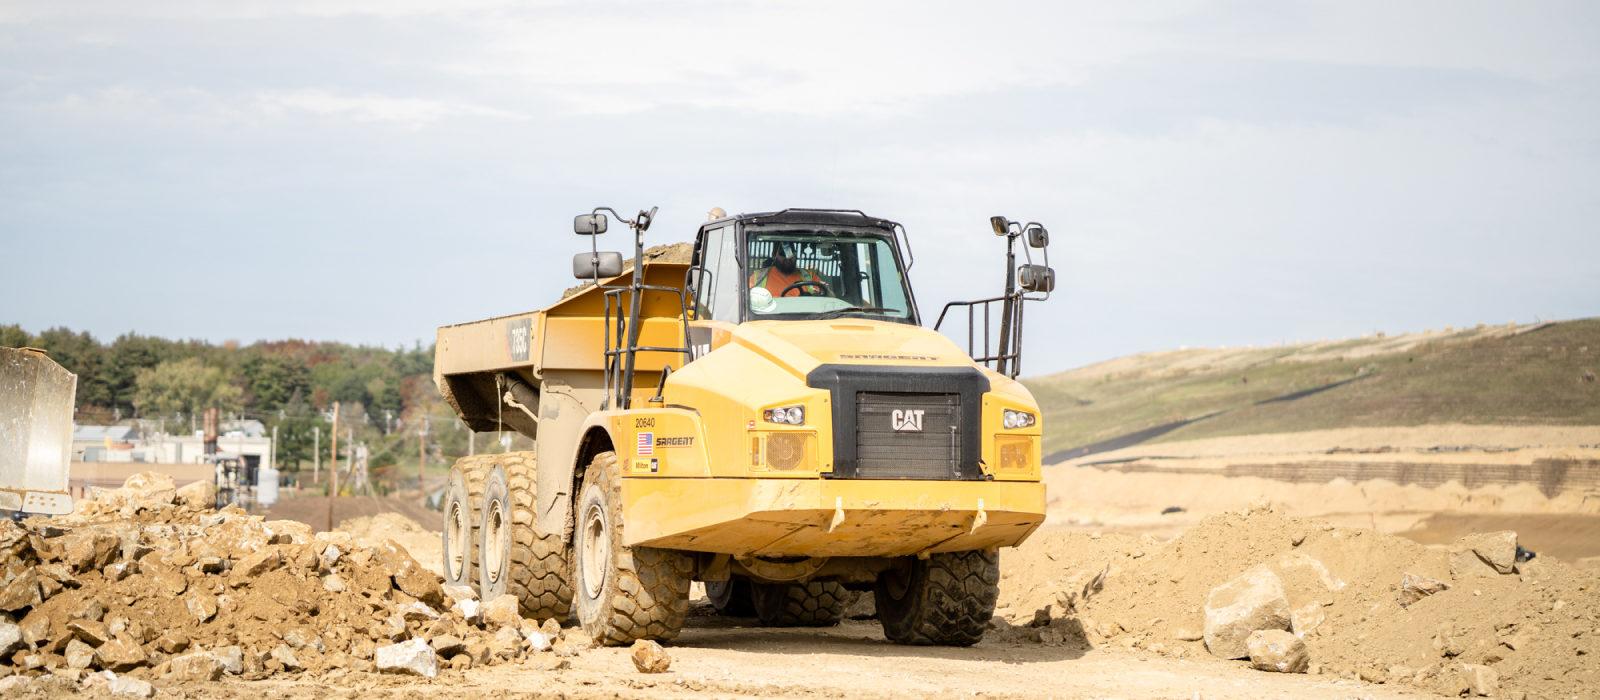 Sargent's CAT 735C Transporting Dirt Soil